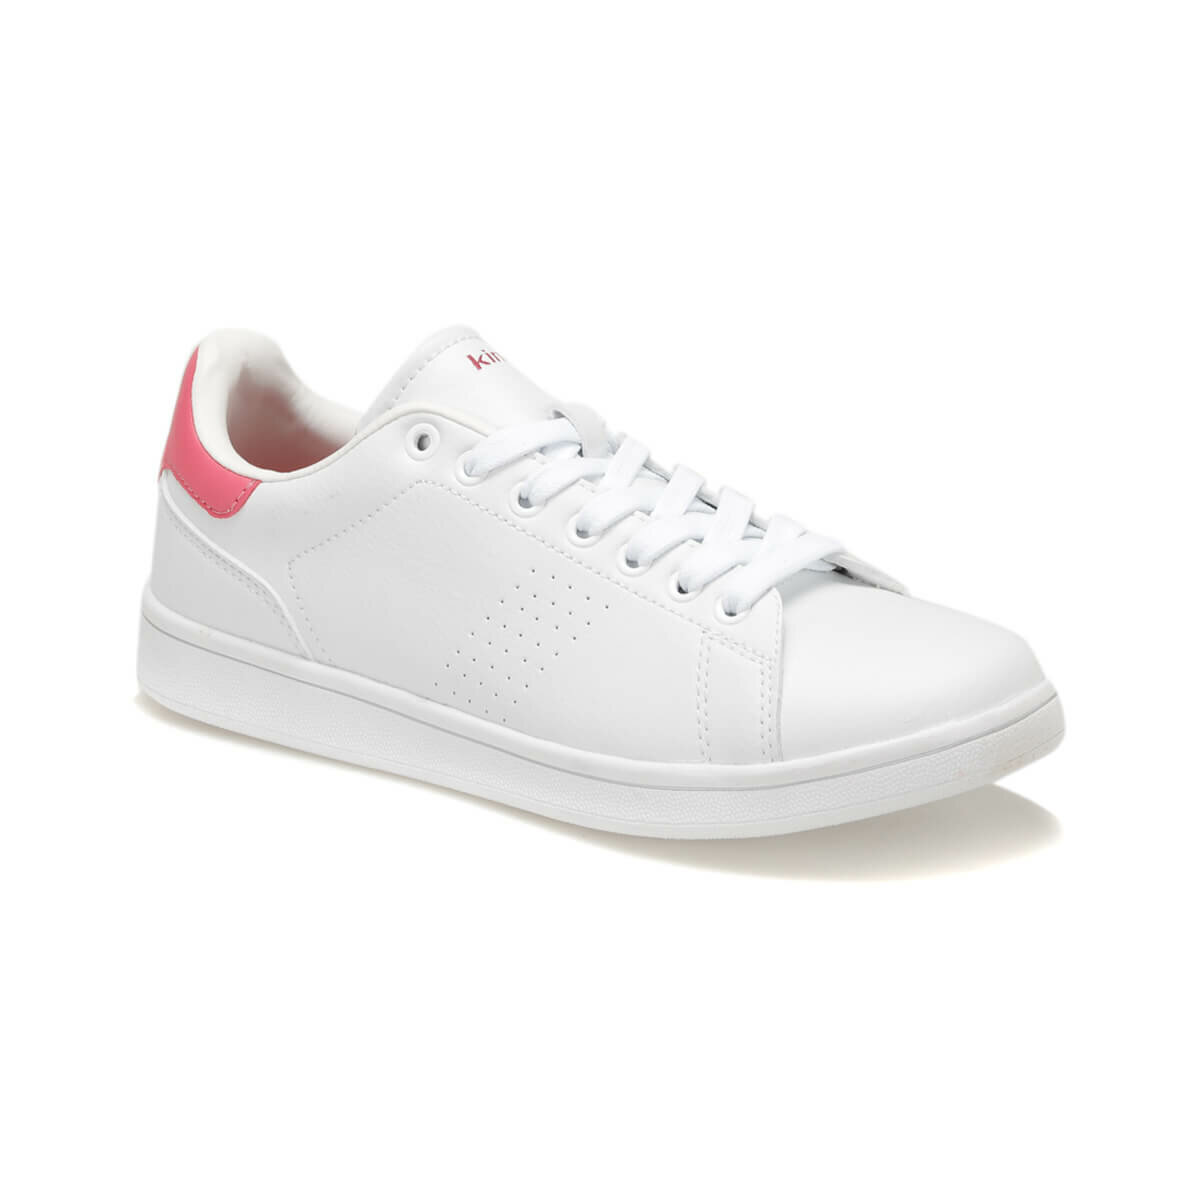 FLO PLAIN W White Women 'S Sneaker Shoes KINETIX